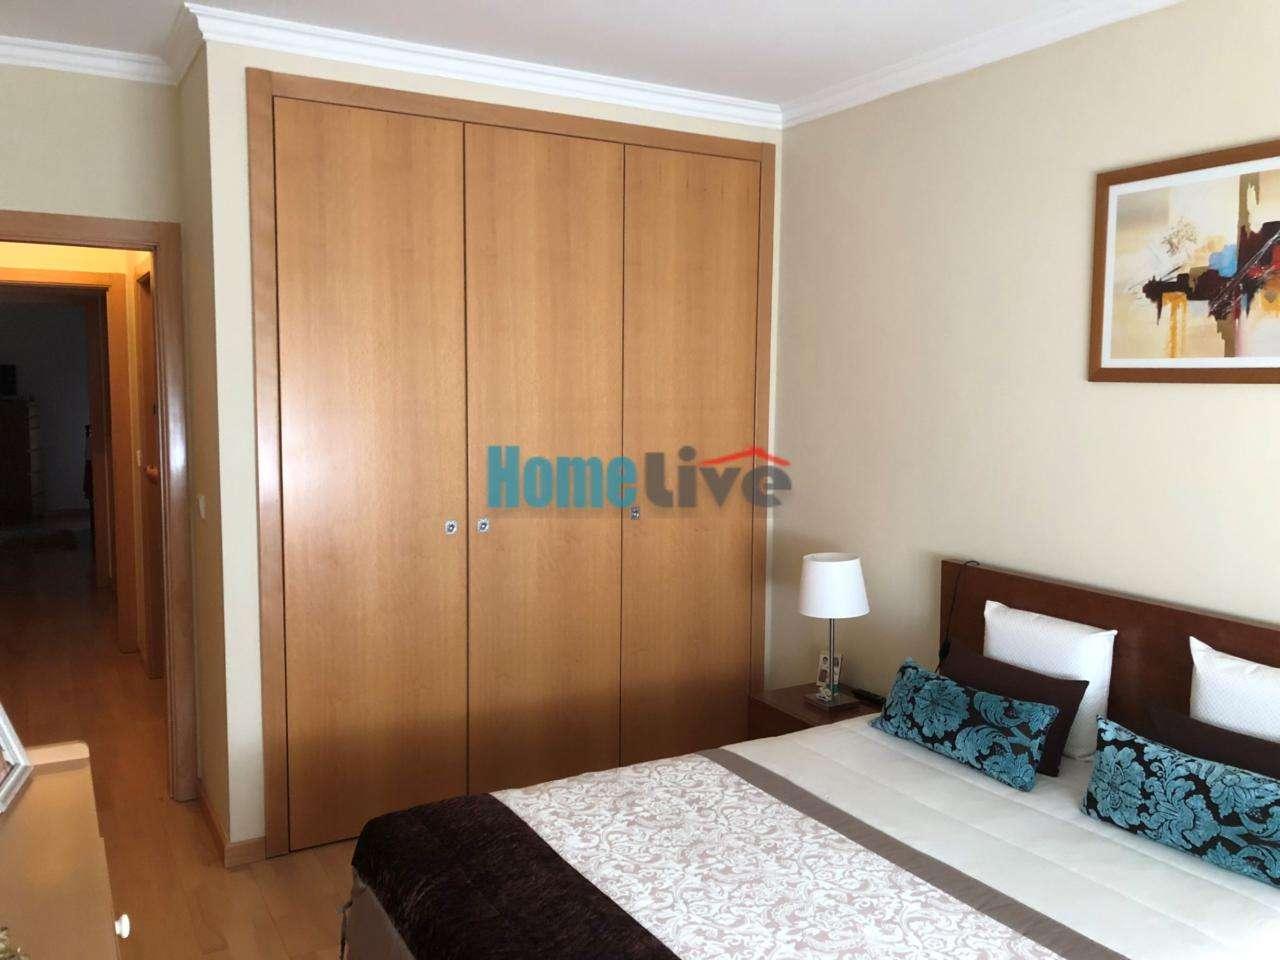 Apartamento para comprar, Póvoa de Santa Iria e Forte da Casa, Vila Franca de Xira, Lisboa - Foto 7